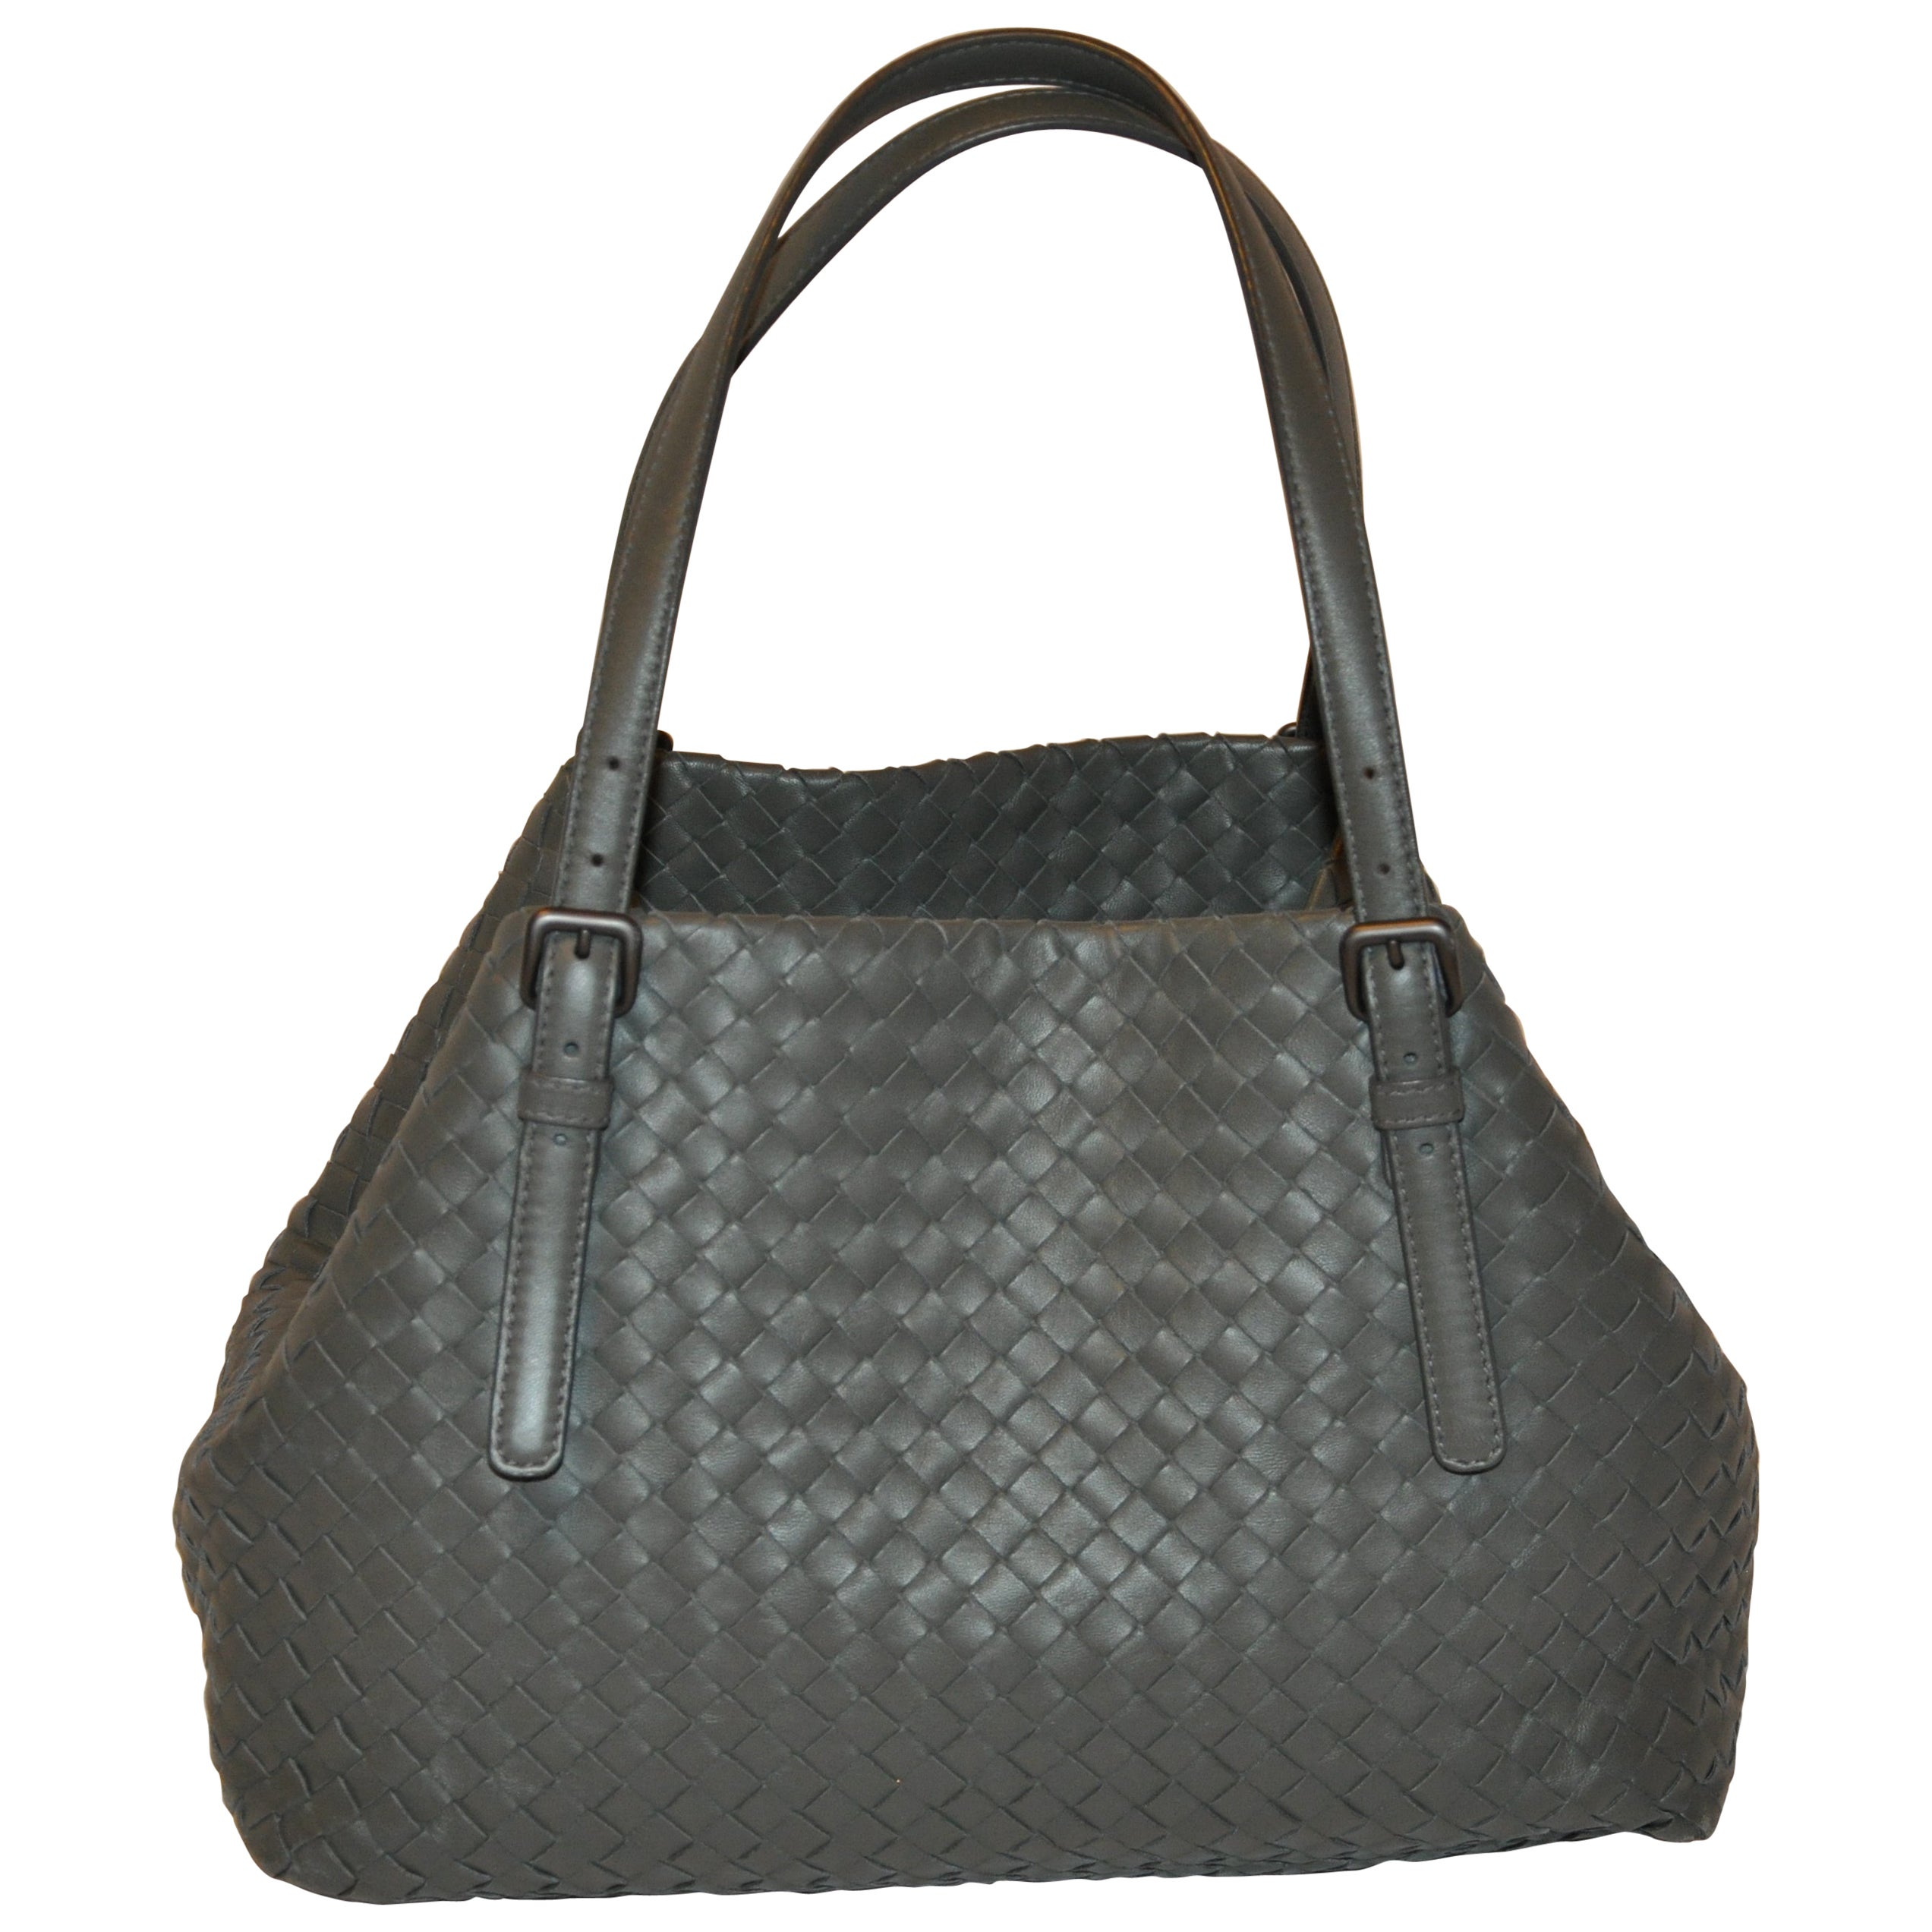 Bottega Veneta Rich Lambskin Signature Taupe Woven Double-Handle Shoulder Bag